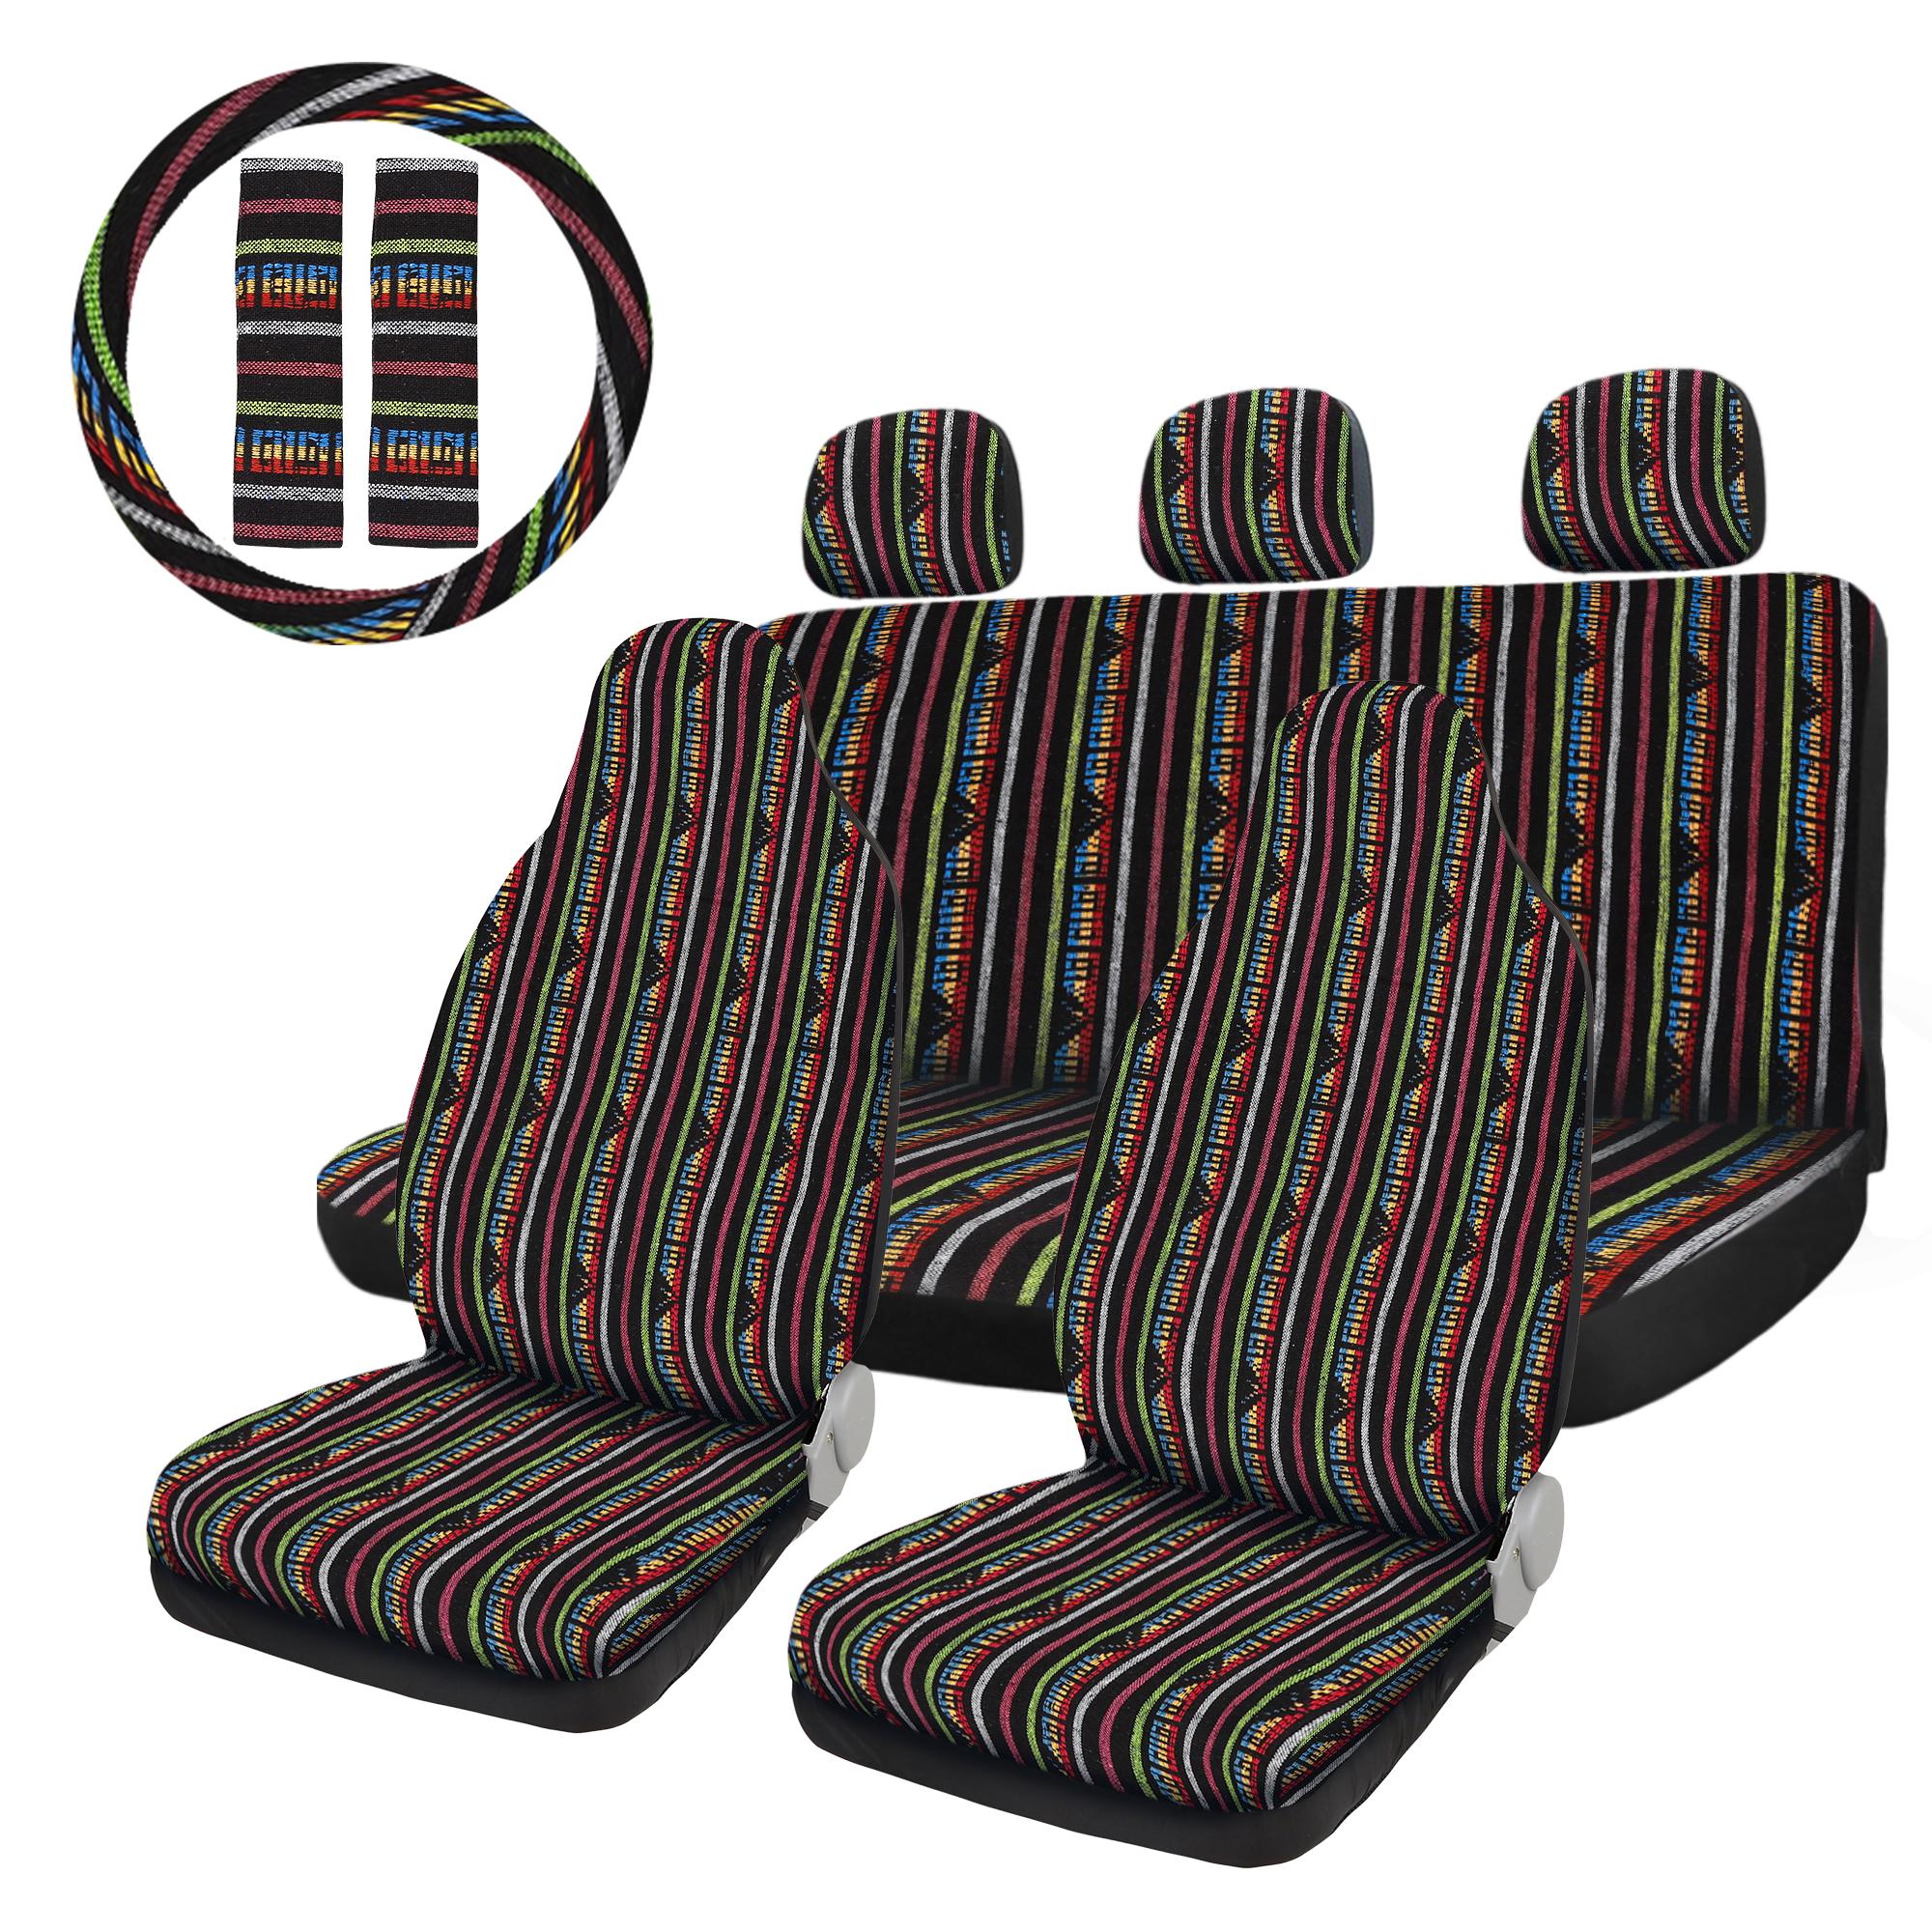 10pcs Universal Stripe Seat Covers Blanket Car Seat Covers Bohemian Style